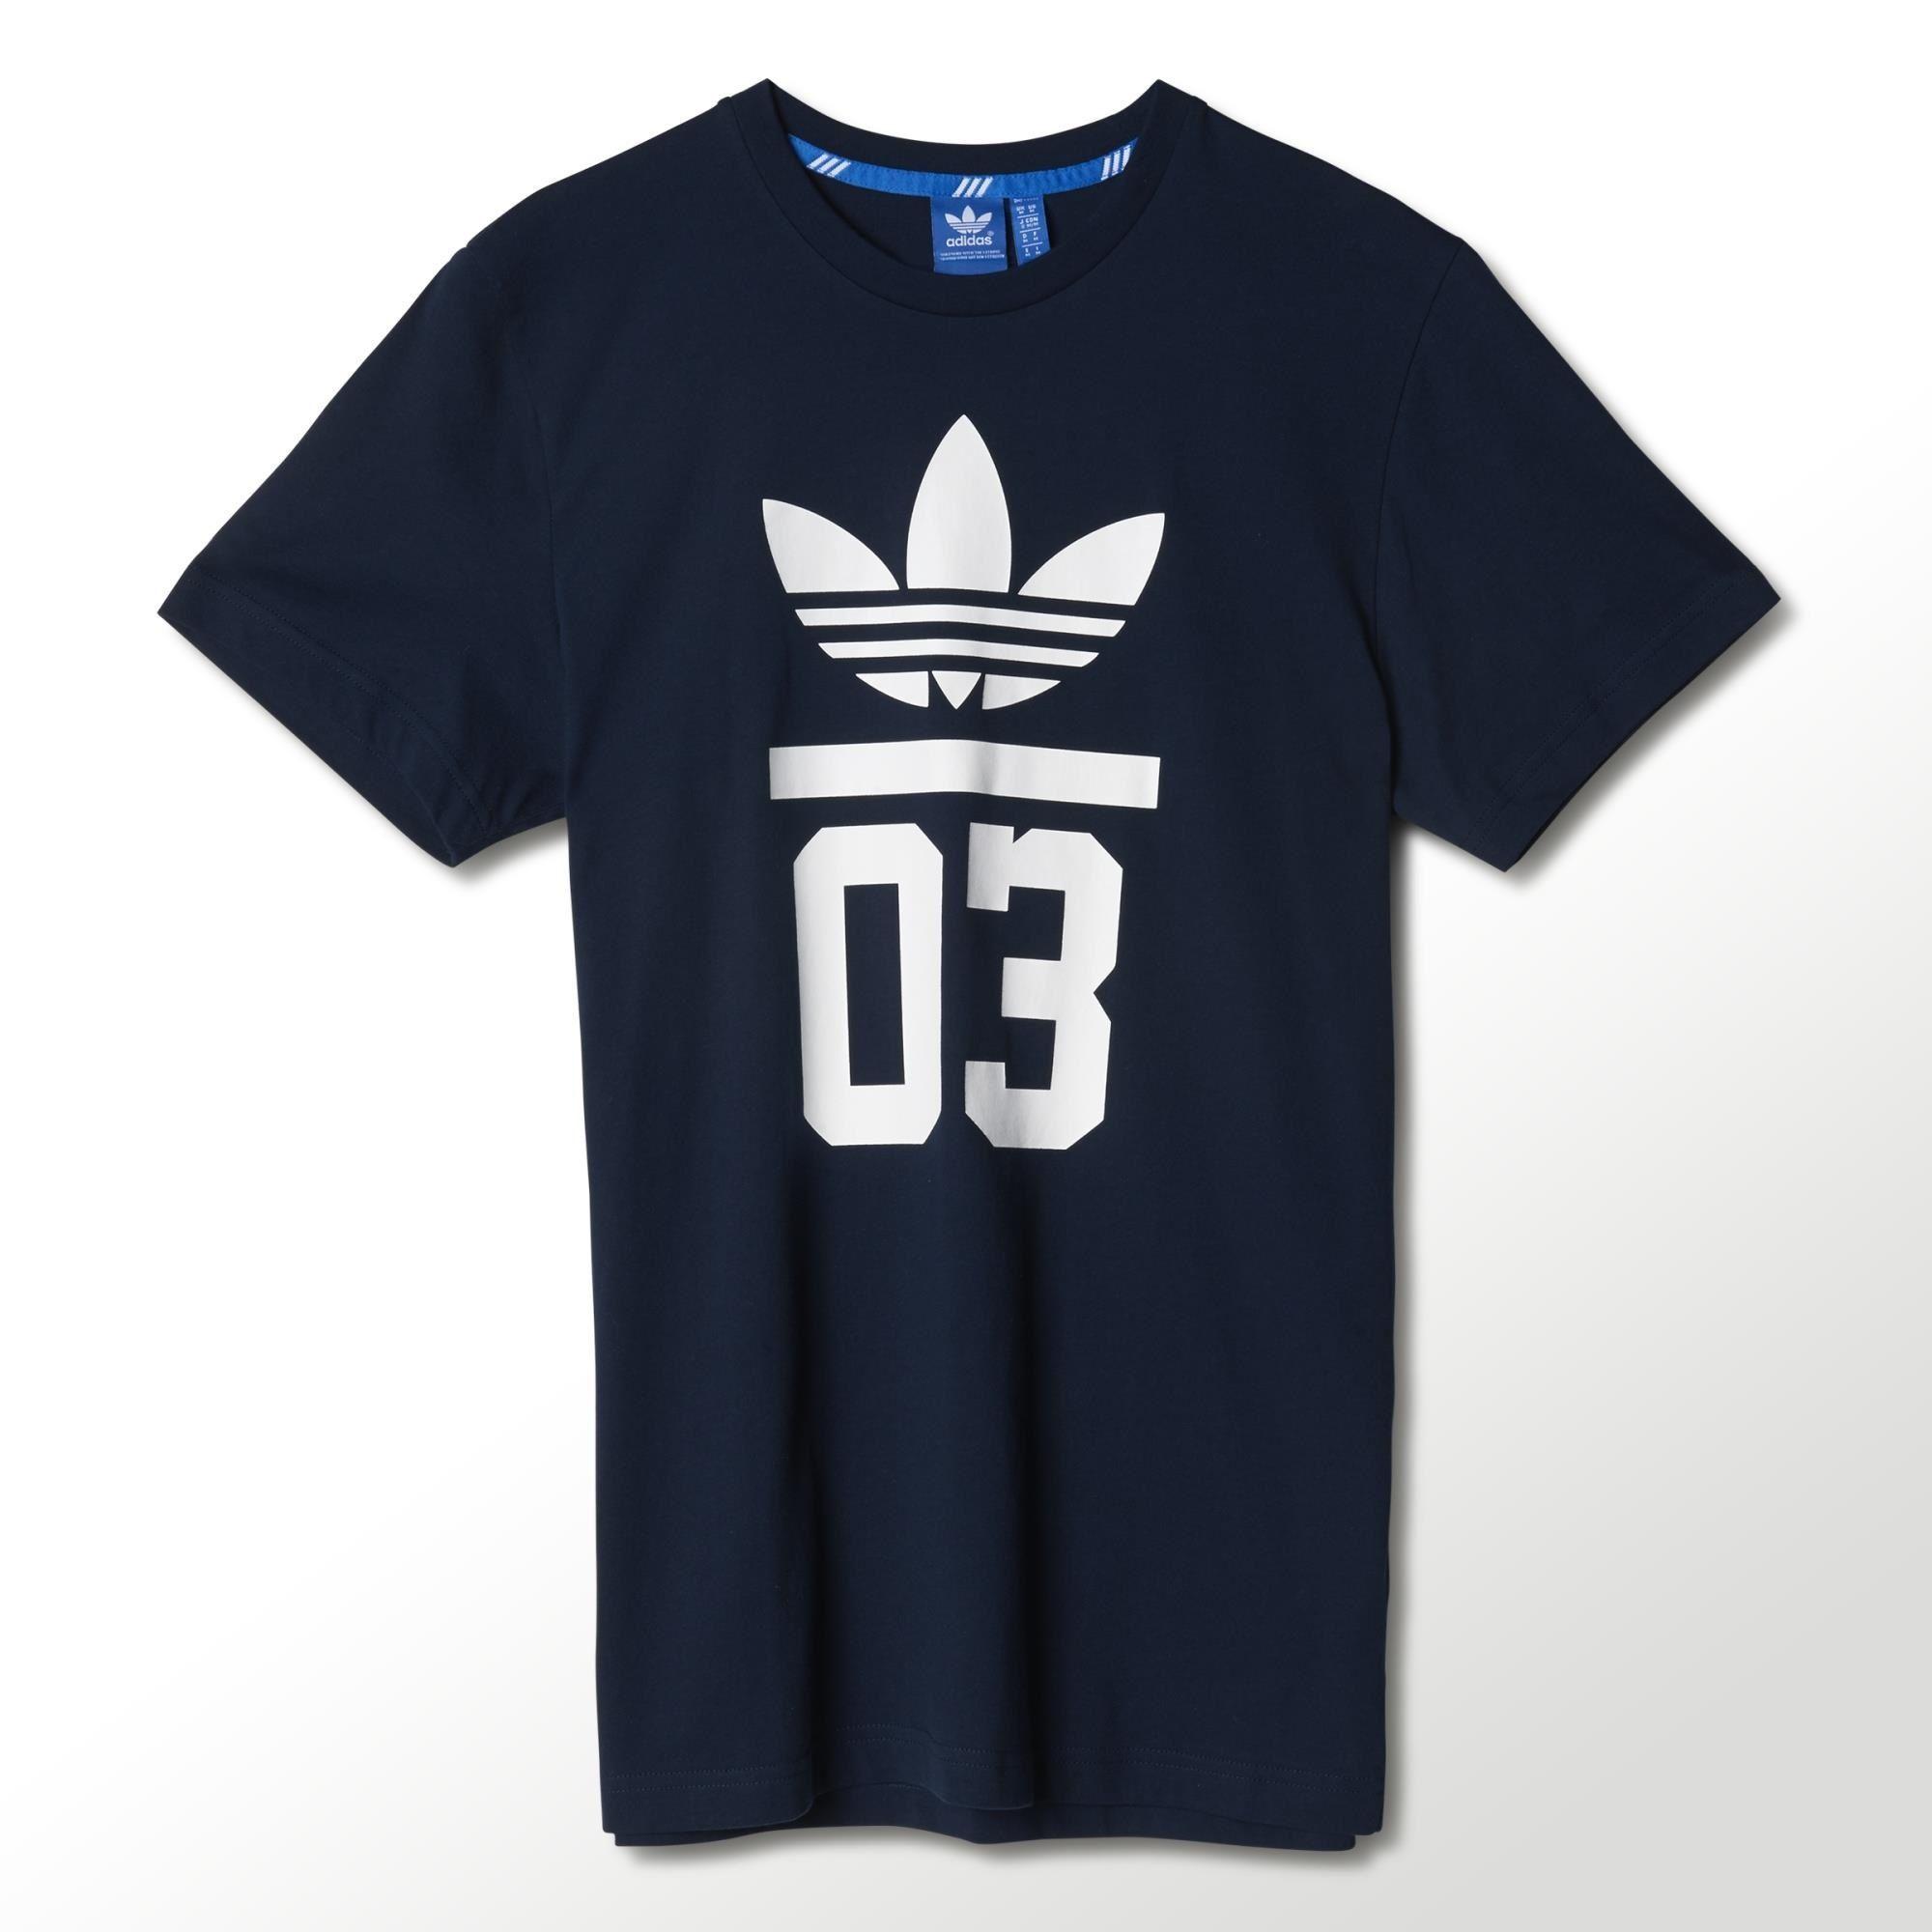 Camiseta deportiva para hombre Adidas Three Stripes